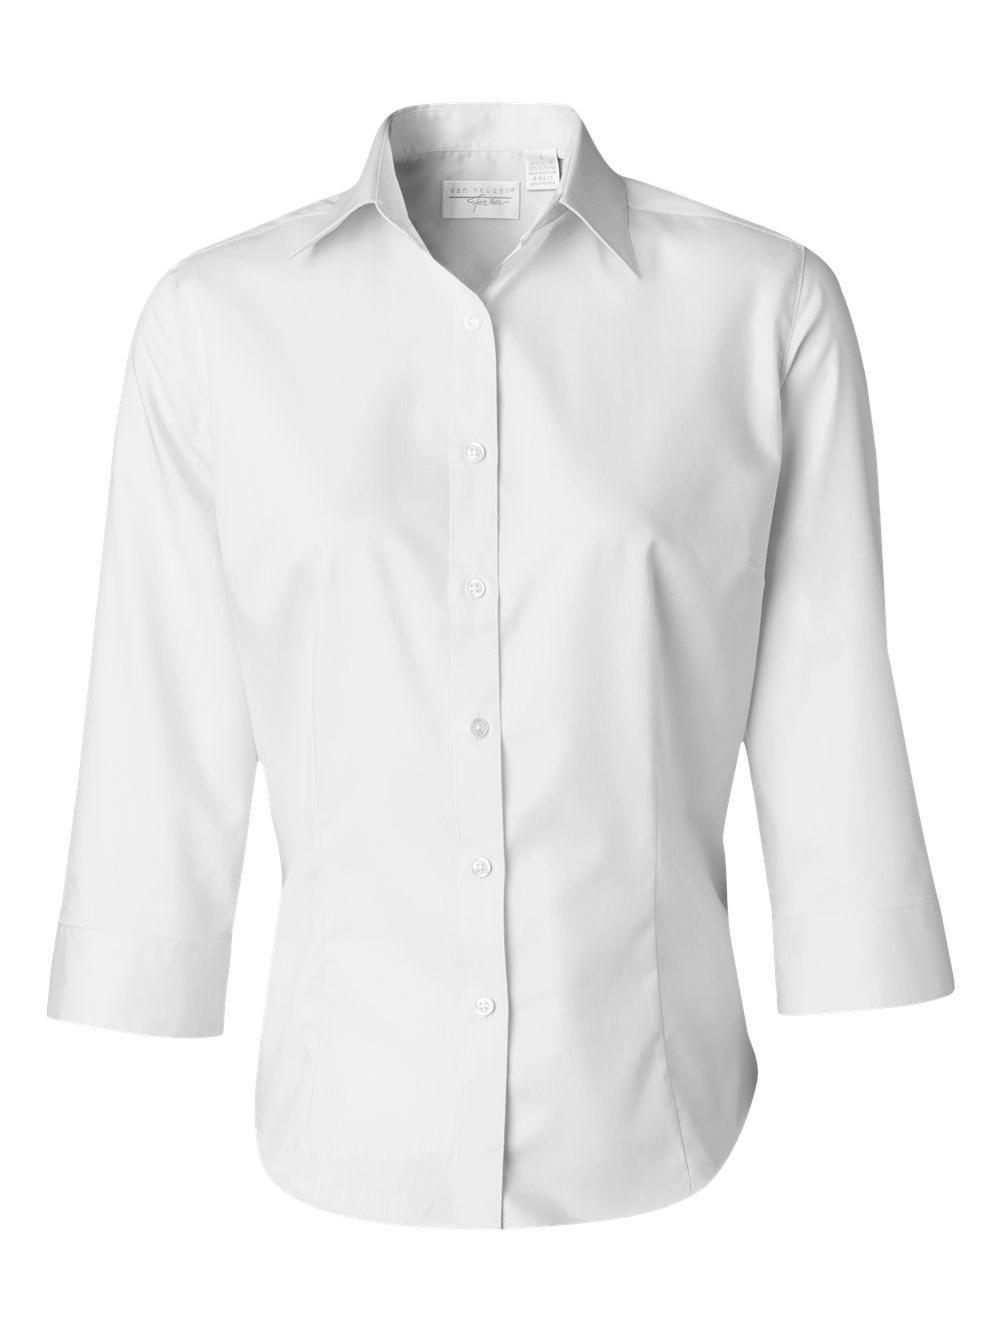 Van-Heusen-Women-039-s-Three-Quarter-Sleeve-Baby-Twill-Shirt-13V0527 thumbnail 18